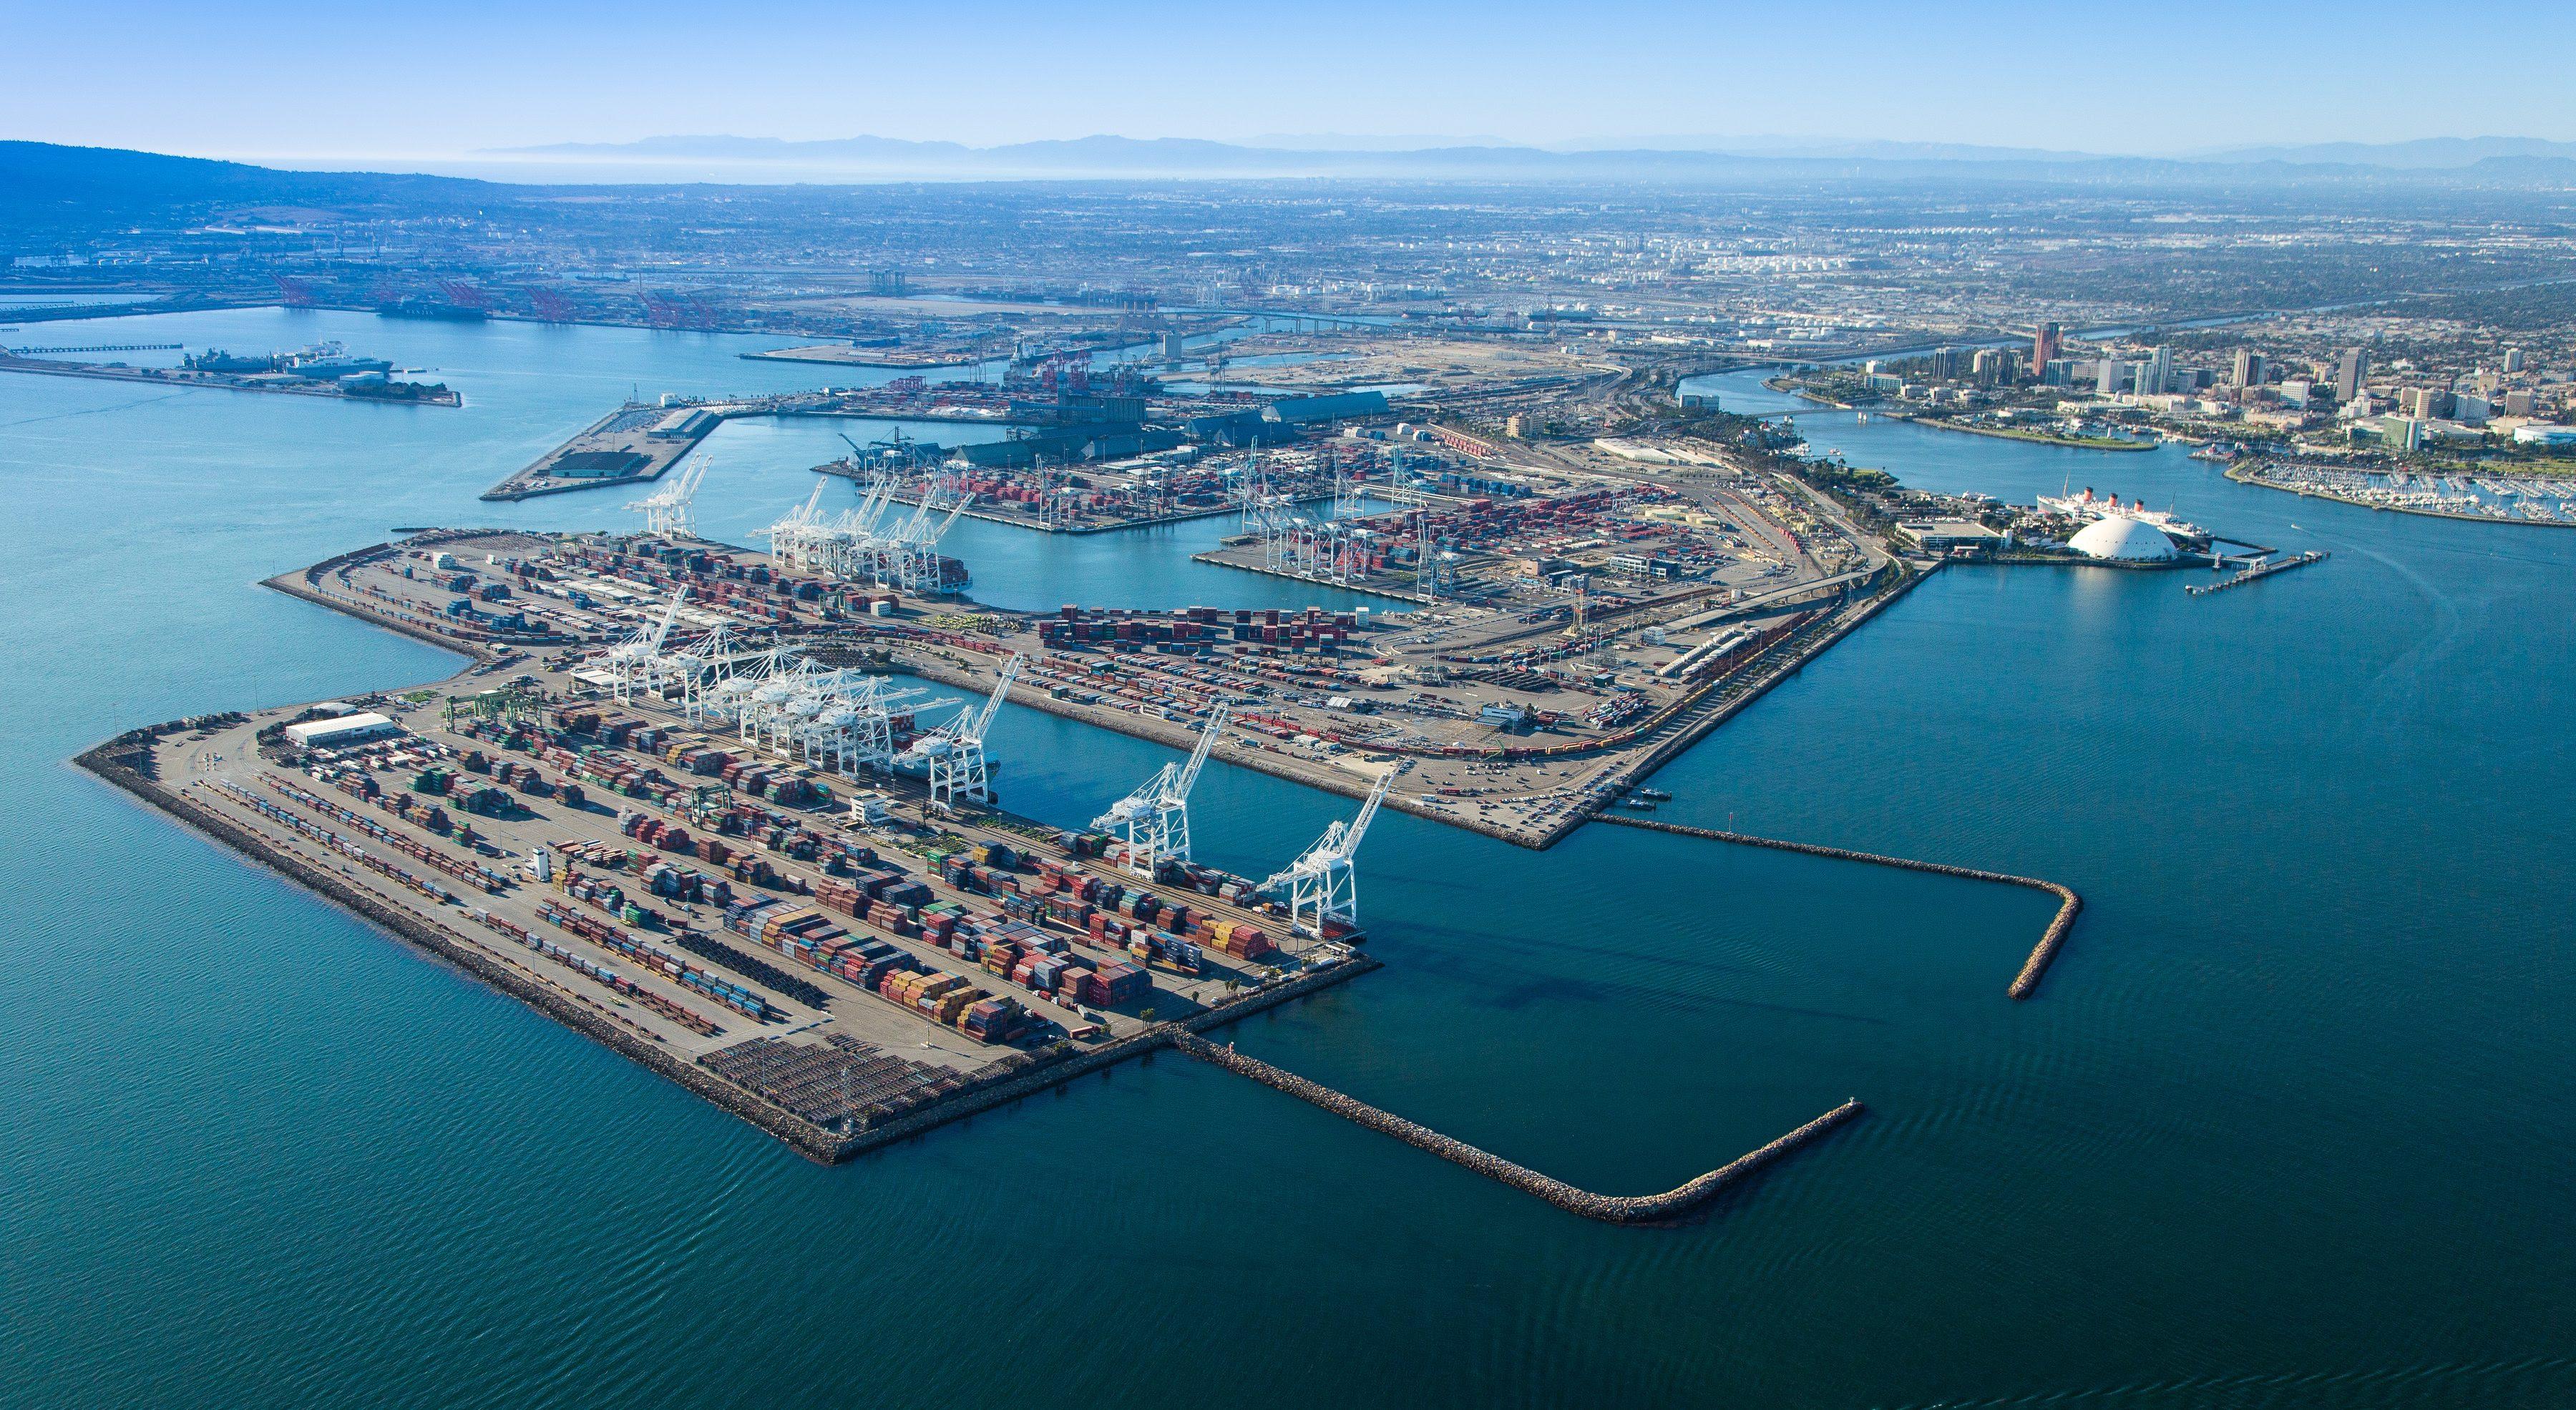 port-of-long-beach-aerial-e1501234283202.jpg